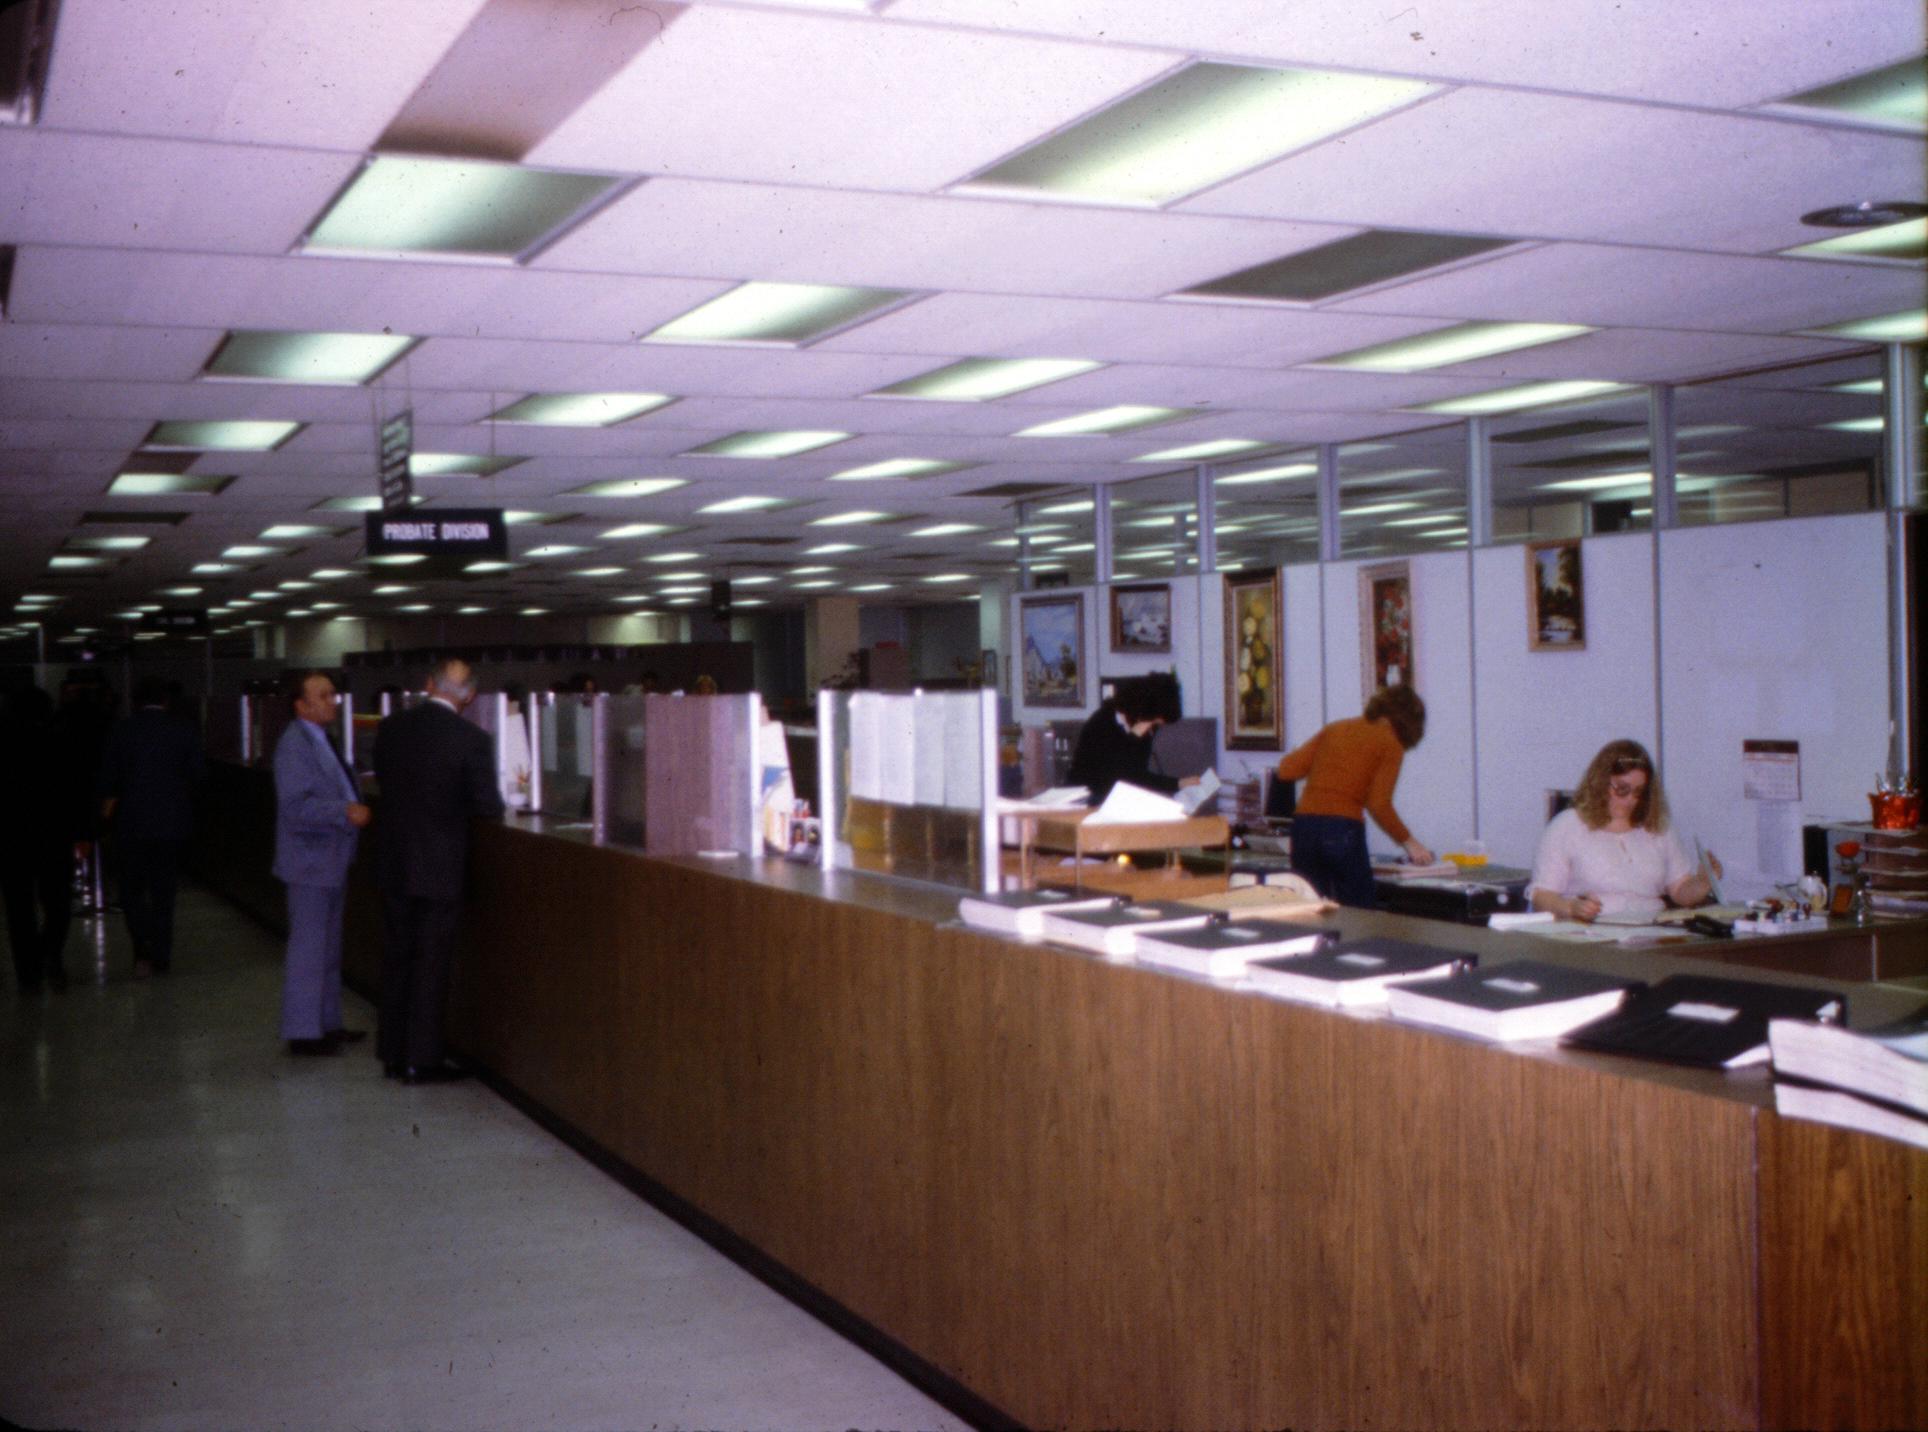 Clerk of the court orange county 1981 flickr photo sharing - Orange county clerk s office ...